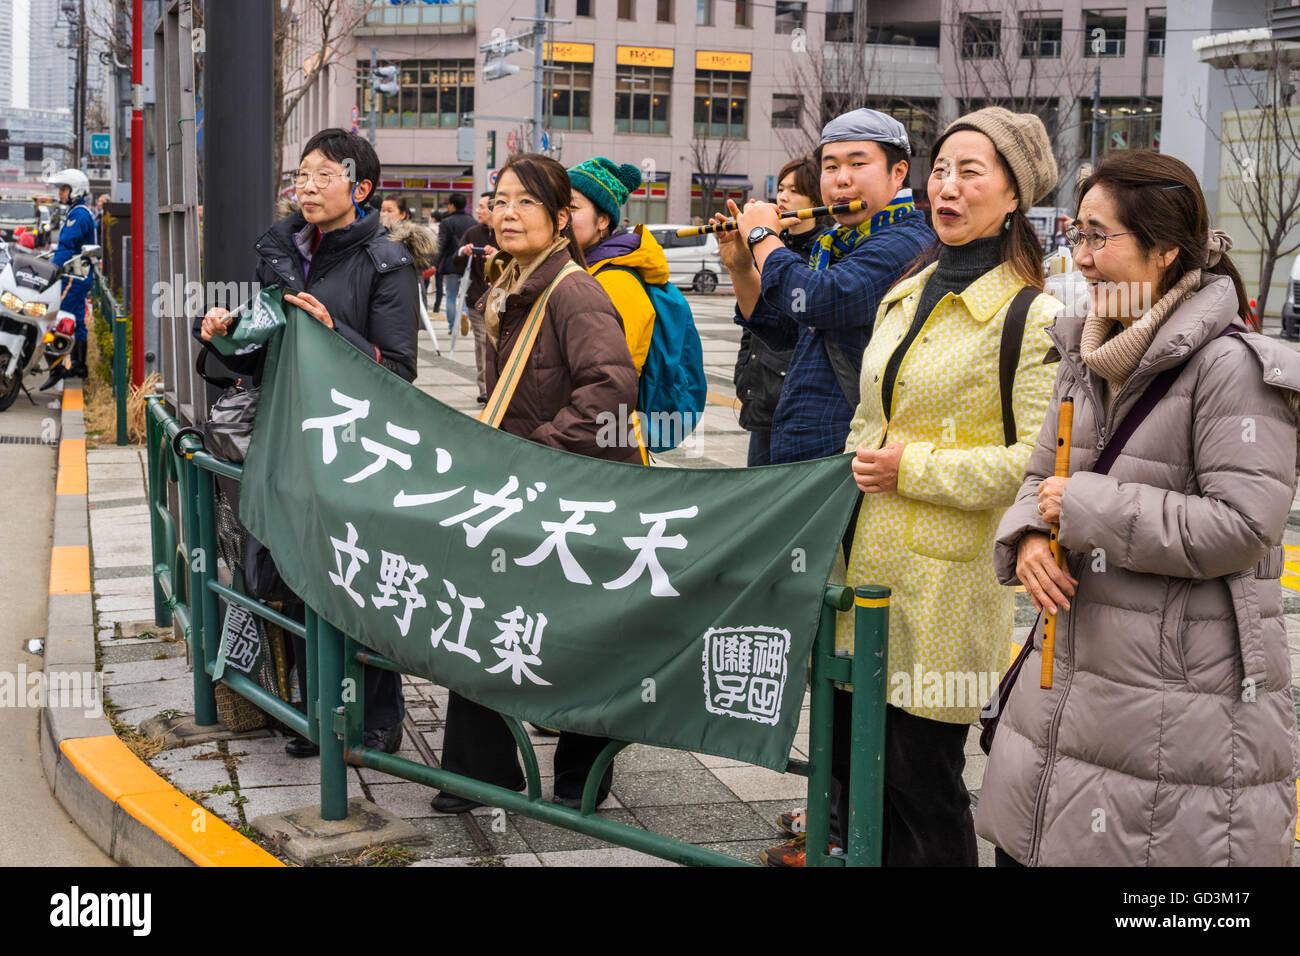 Les citoyens japonais cheering marathon, Tokyo, Japon Photo Stock